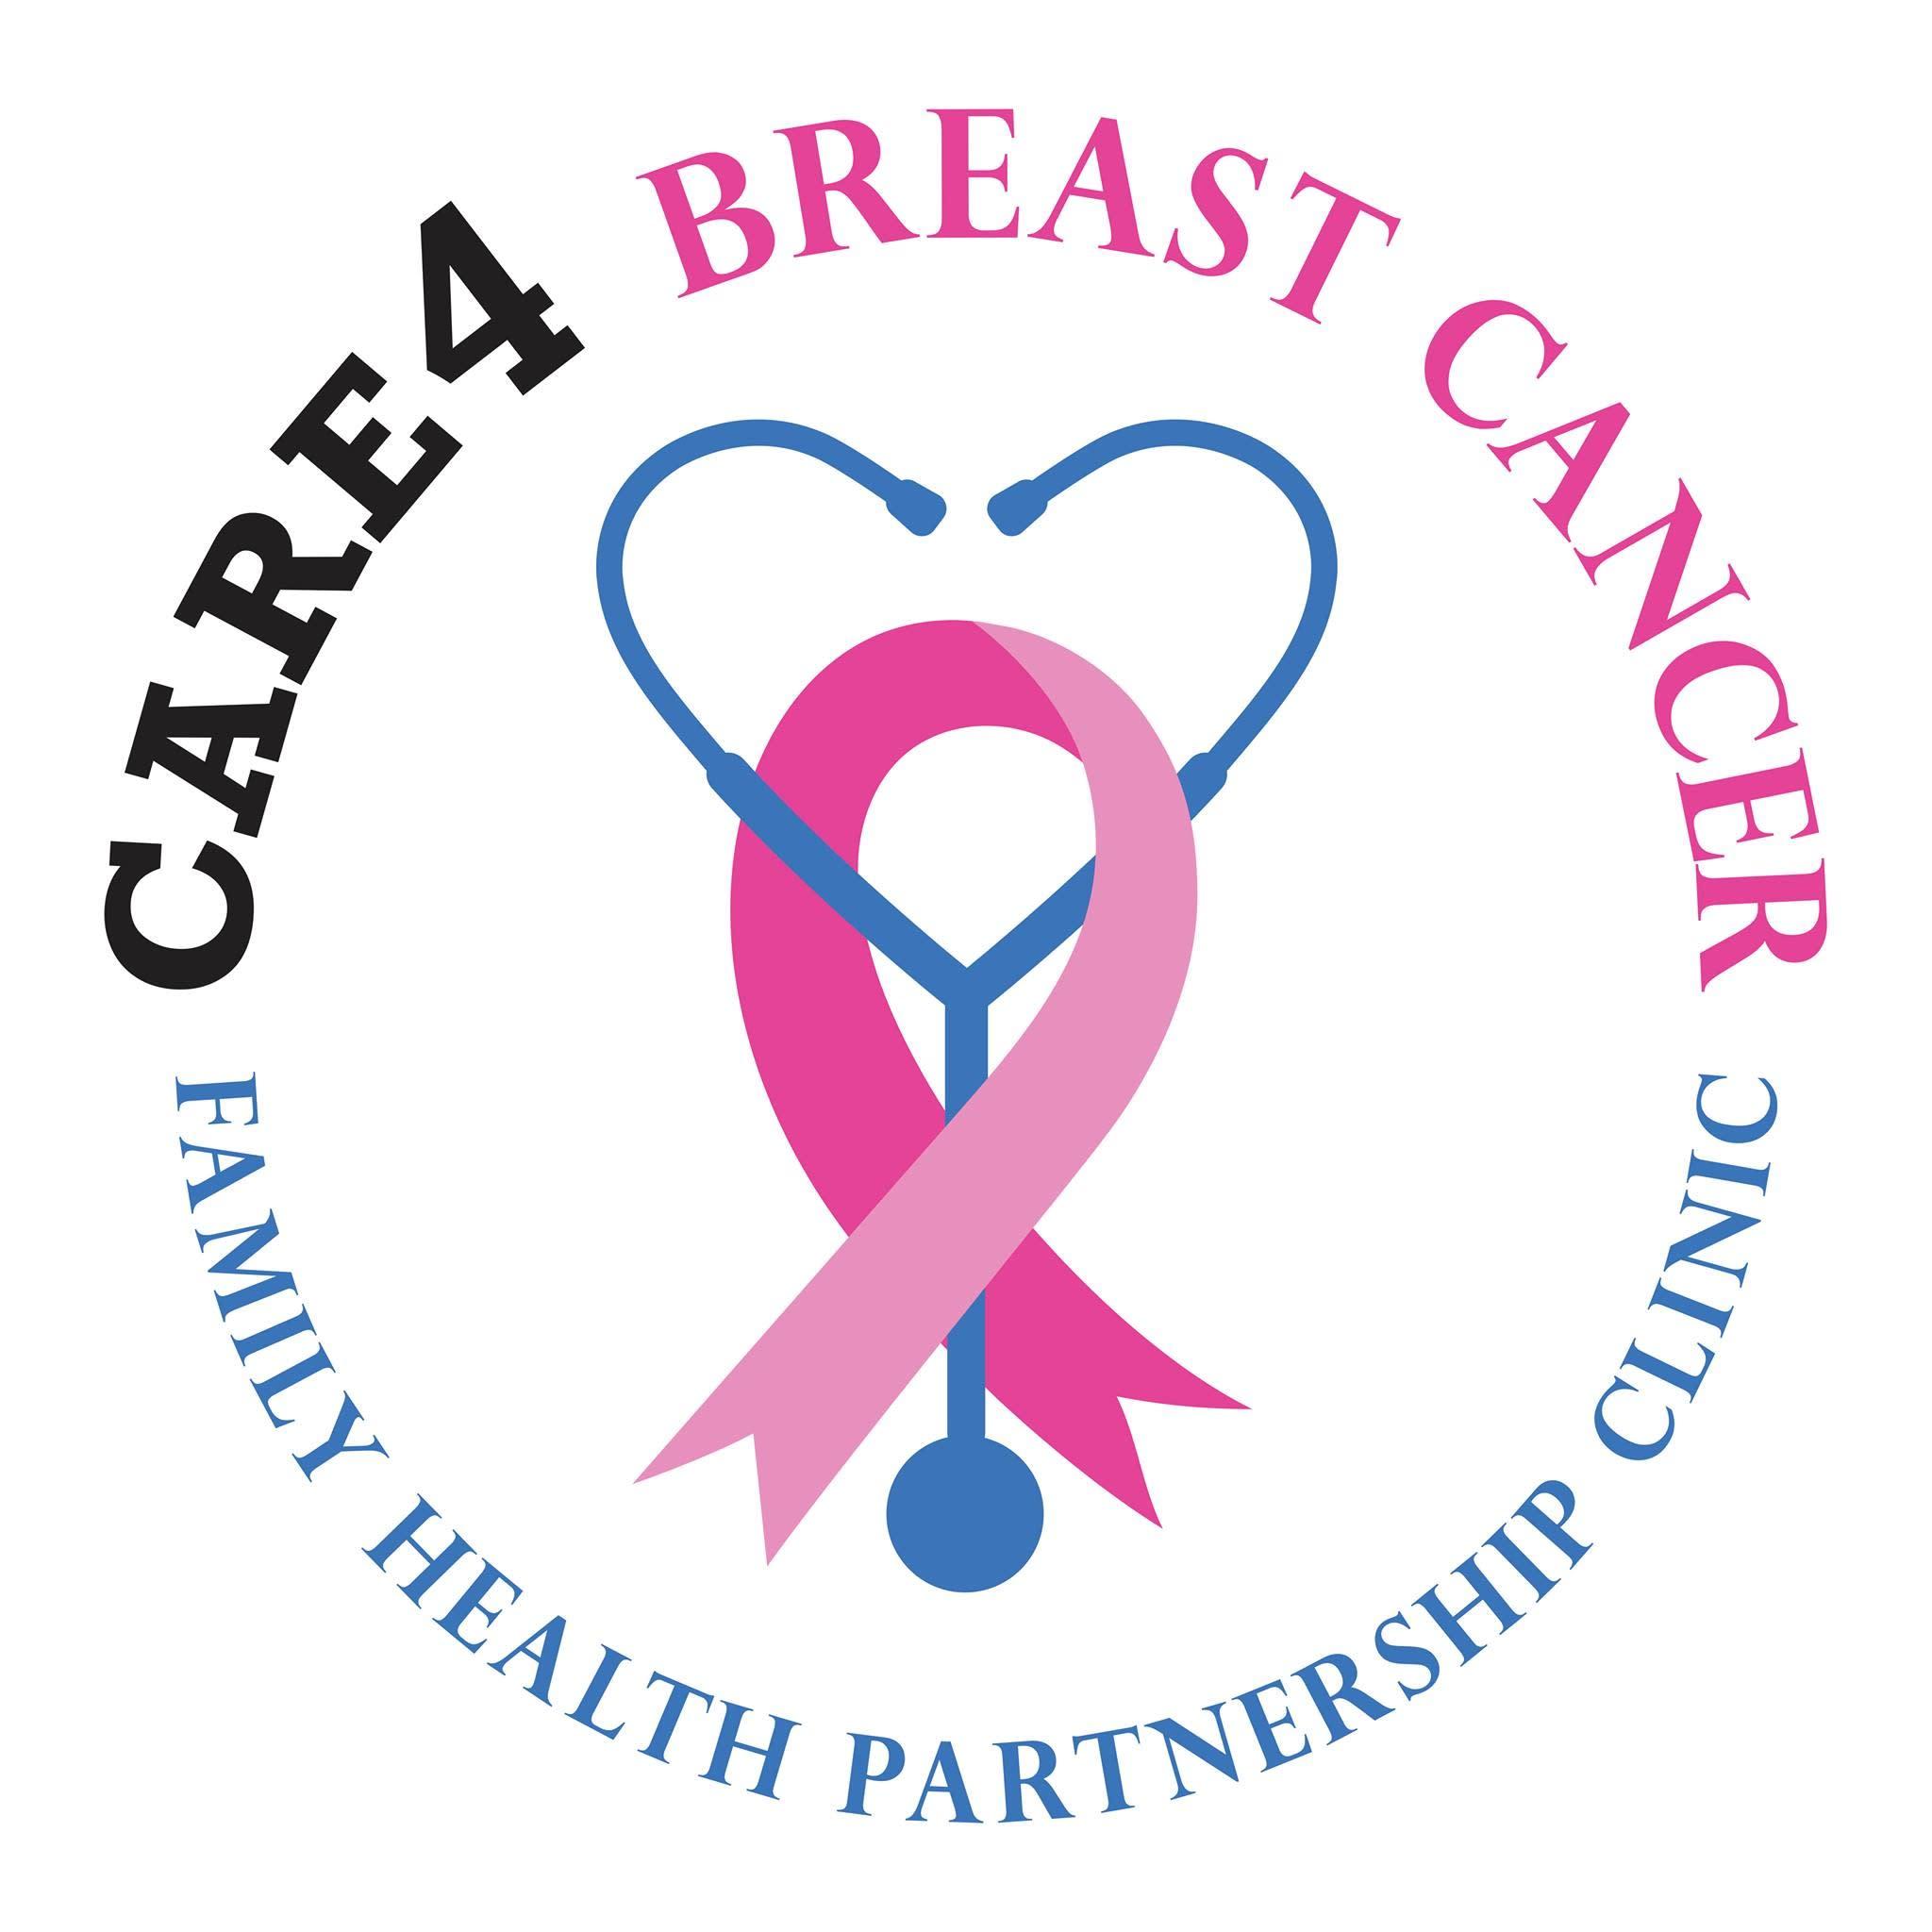 care4breastcancer.org